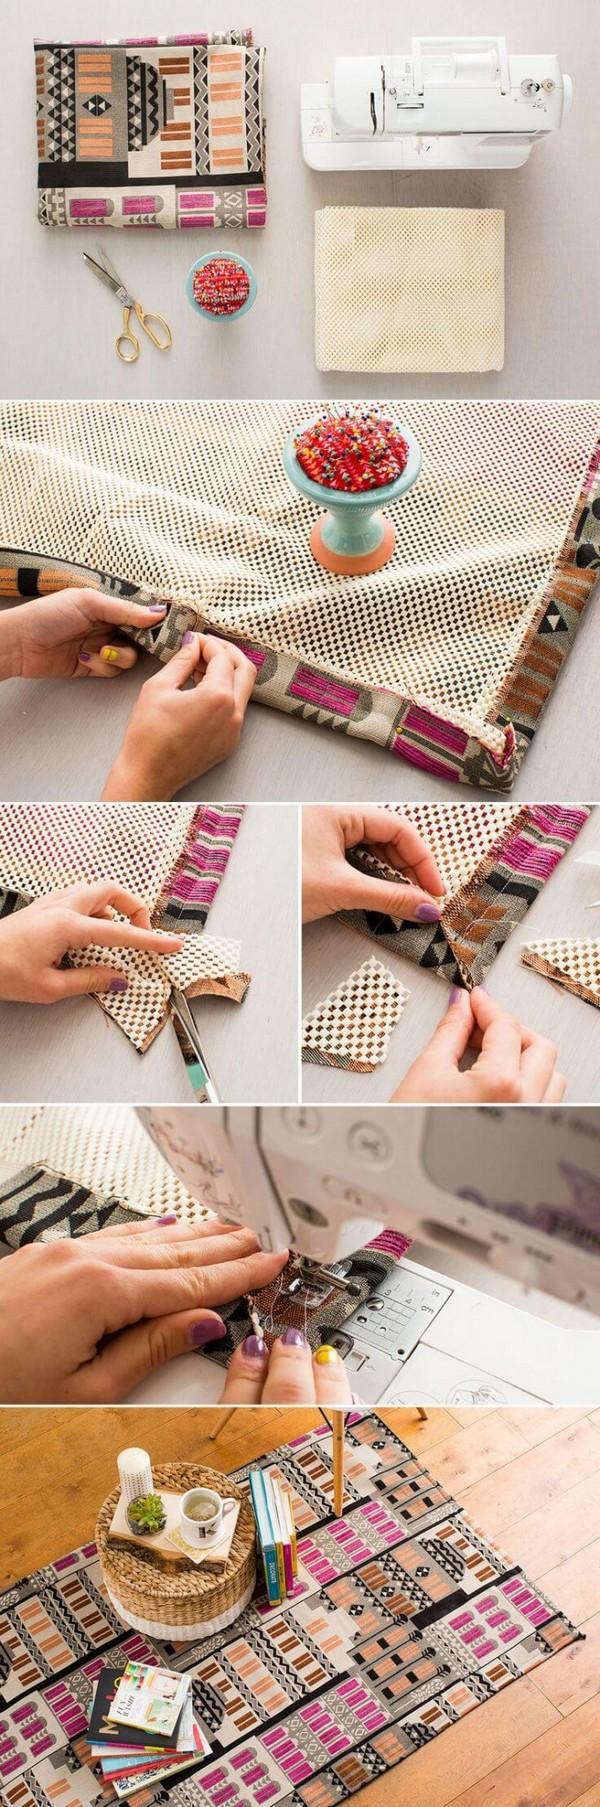 DIY Tapetes decoracao 1